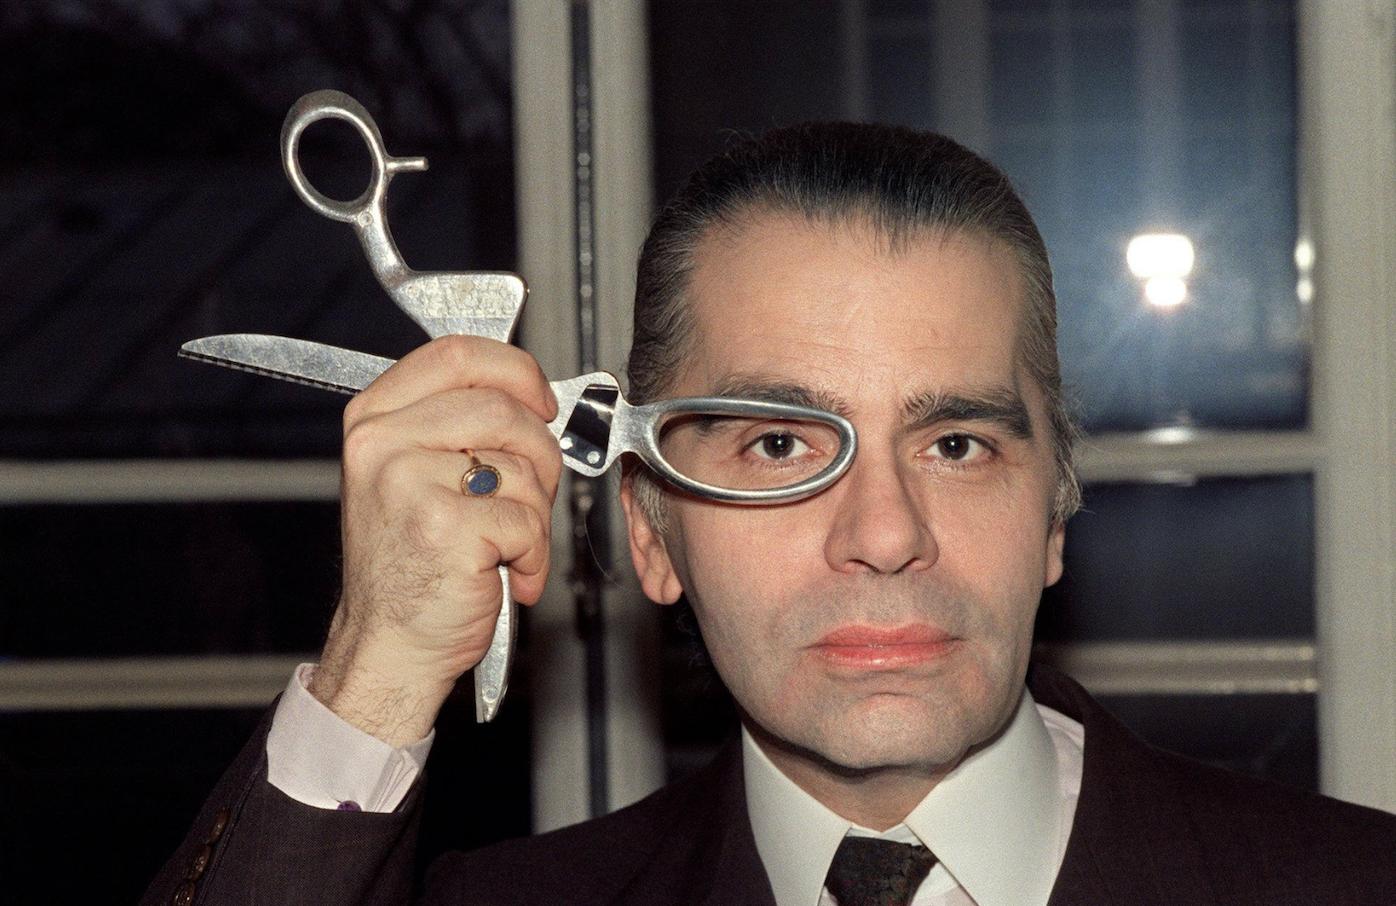 Remembering Karl Lagerfeld: King of Fashion